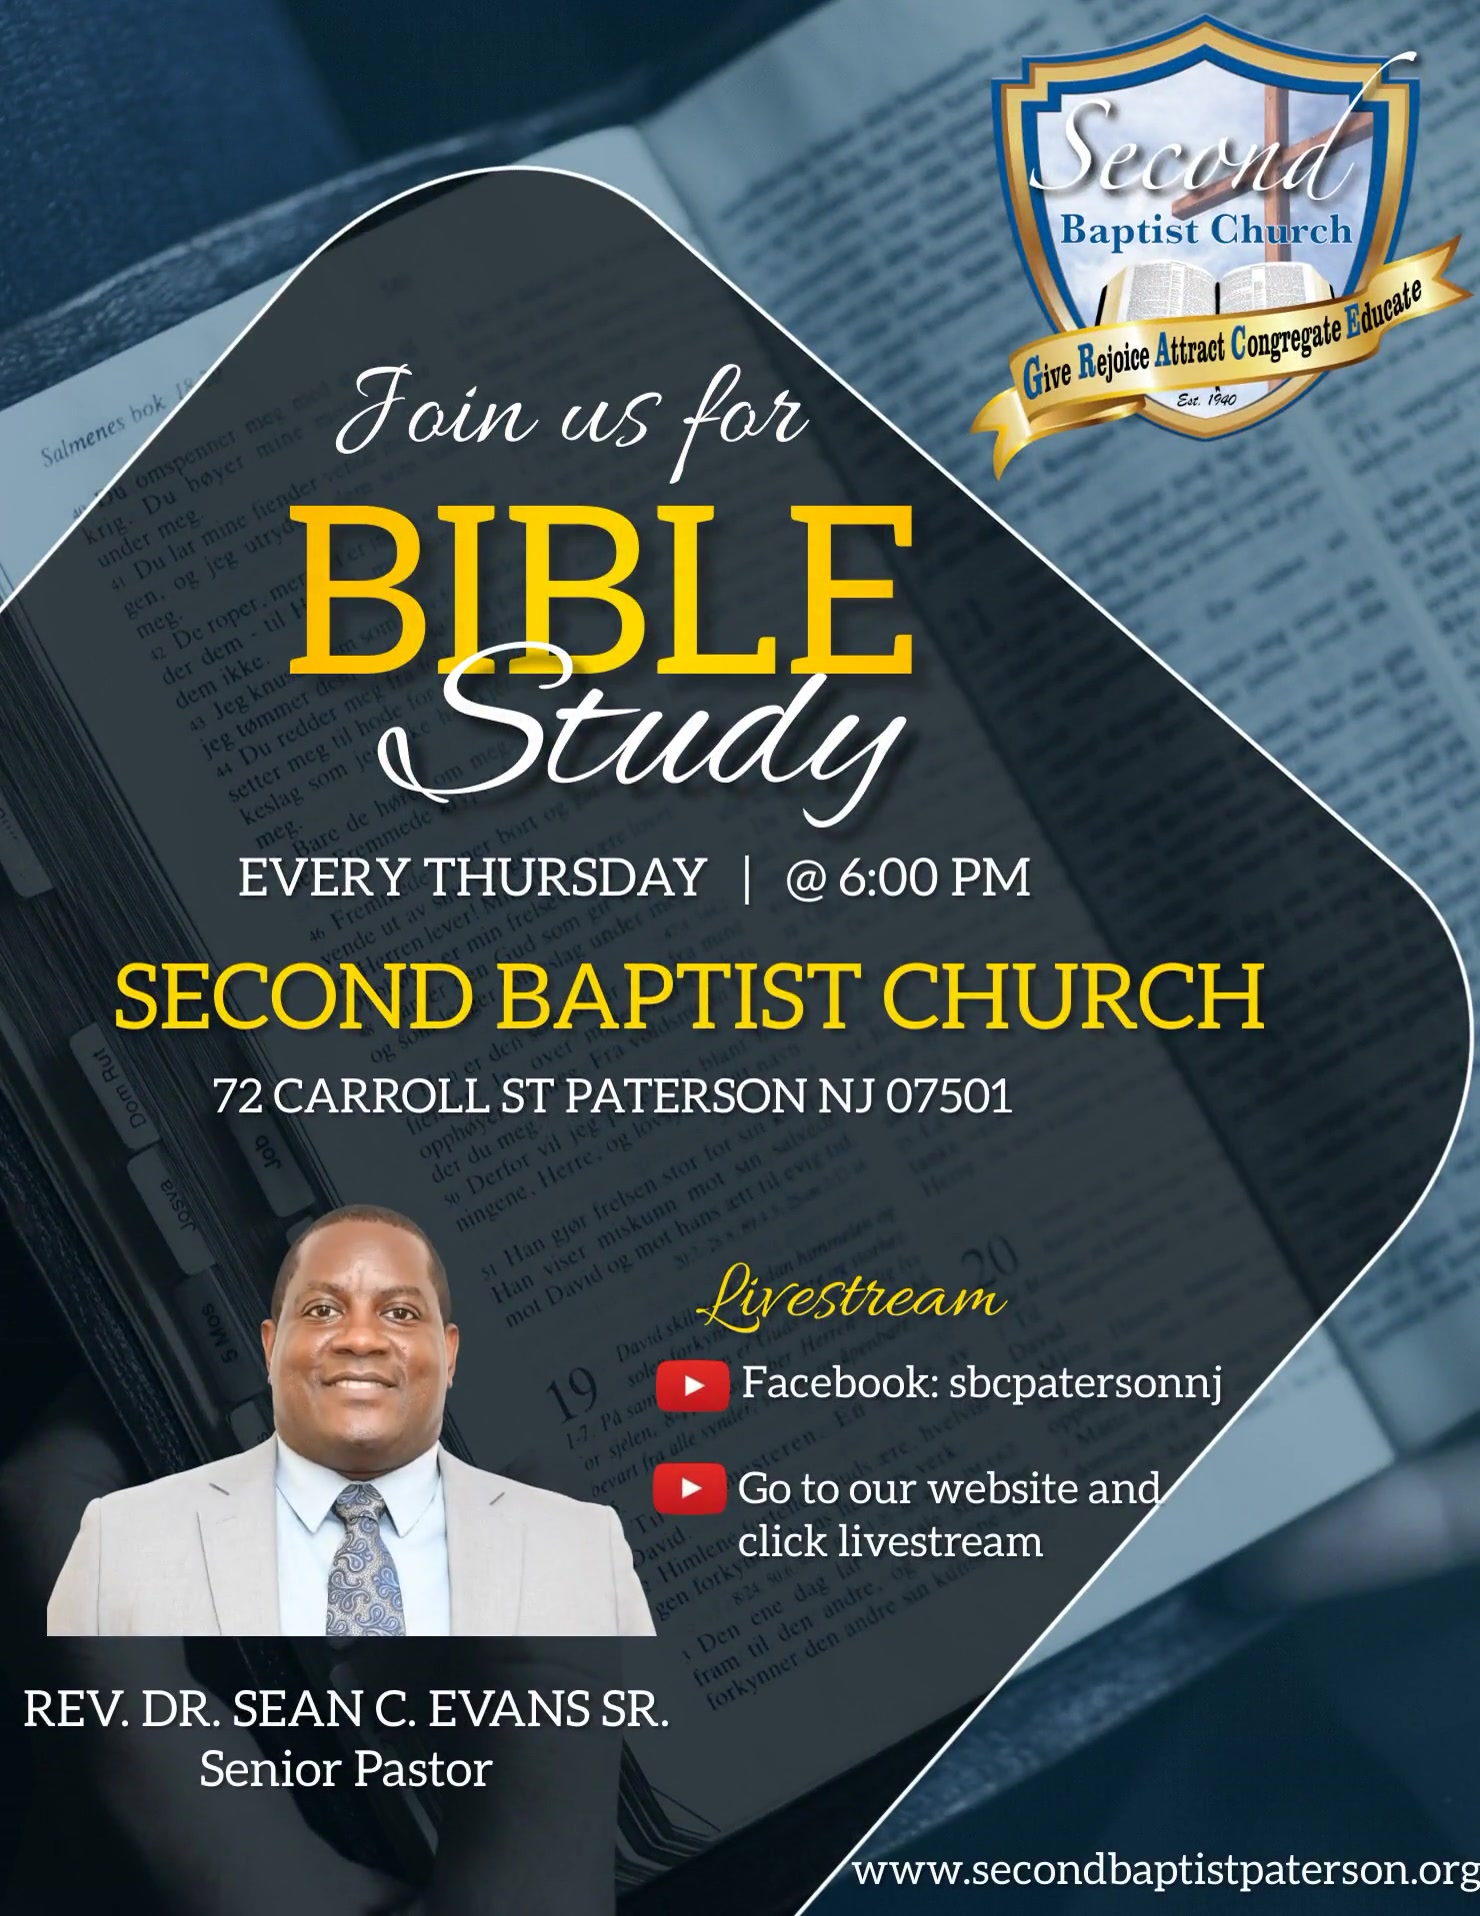 SBC bible study flyer_02